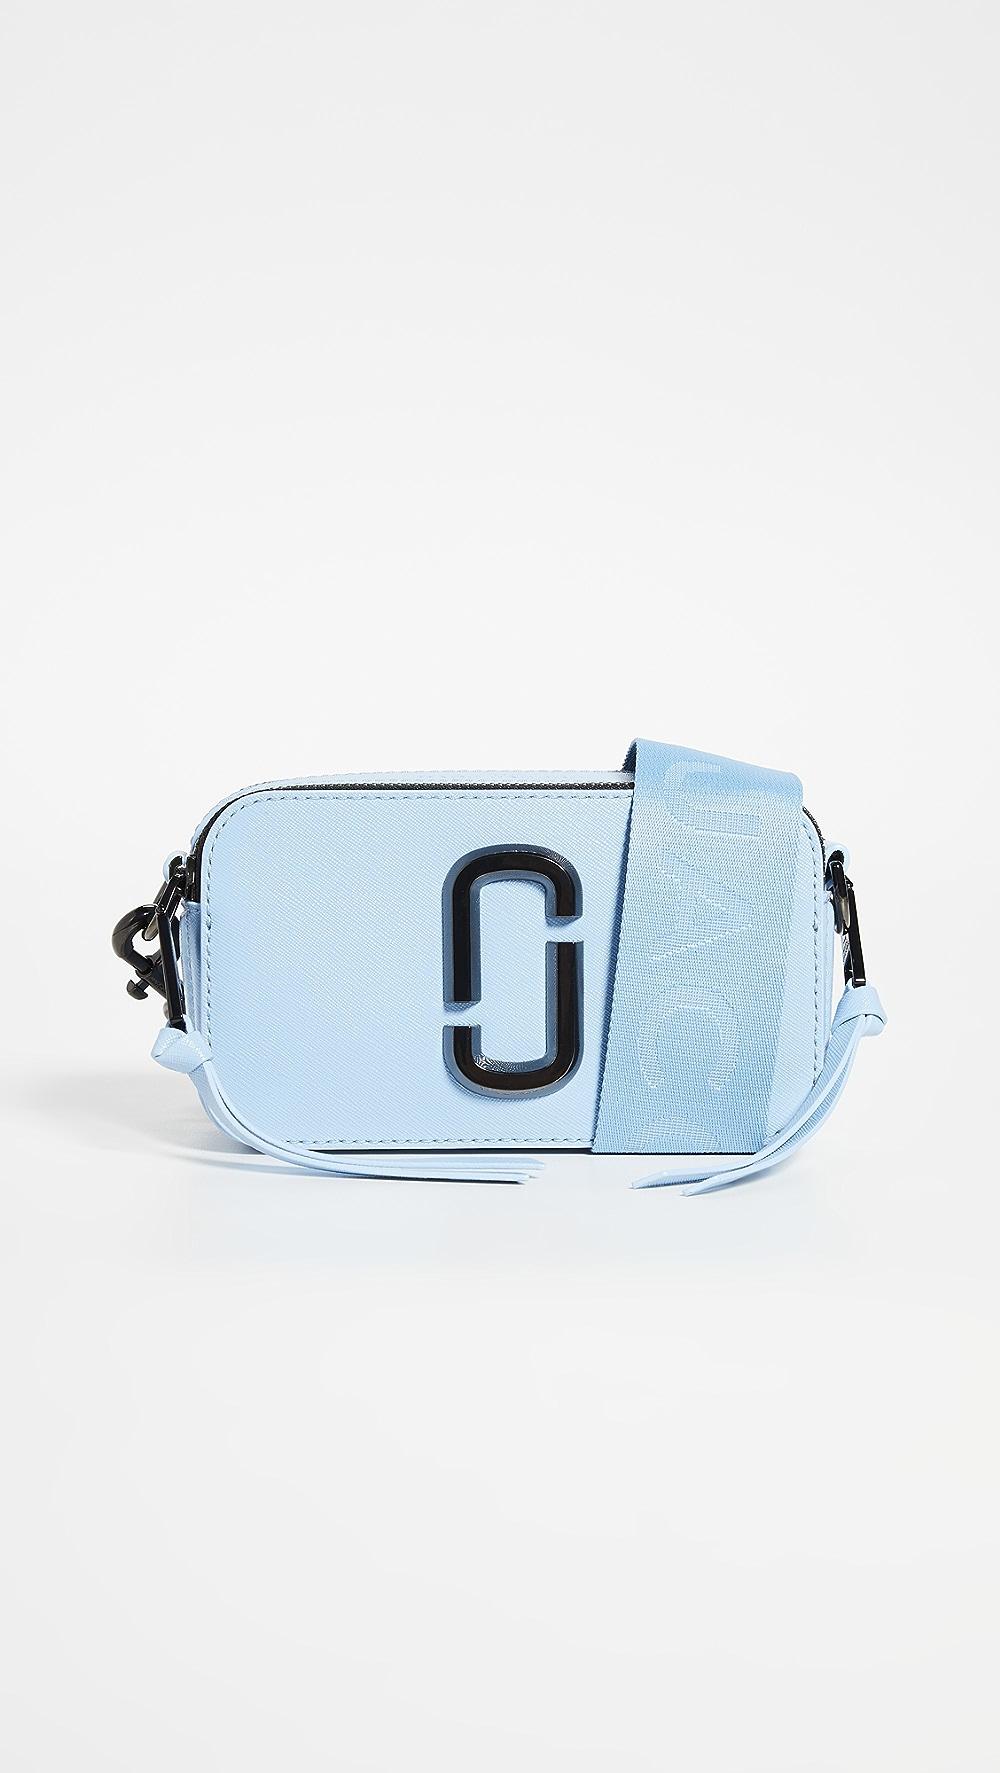 Aggressive The Marc Jacobs - Snapshot Dtm Camera Bag Clear-Cut Texture